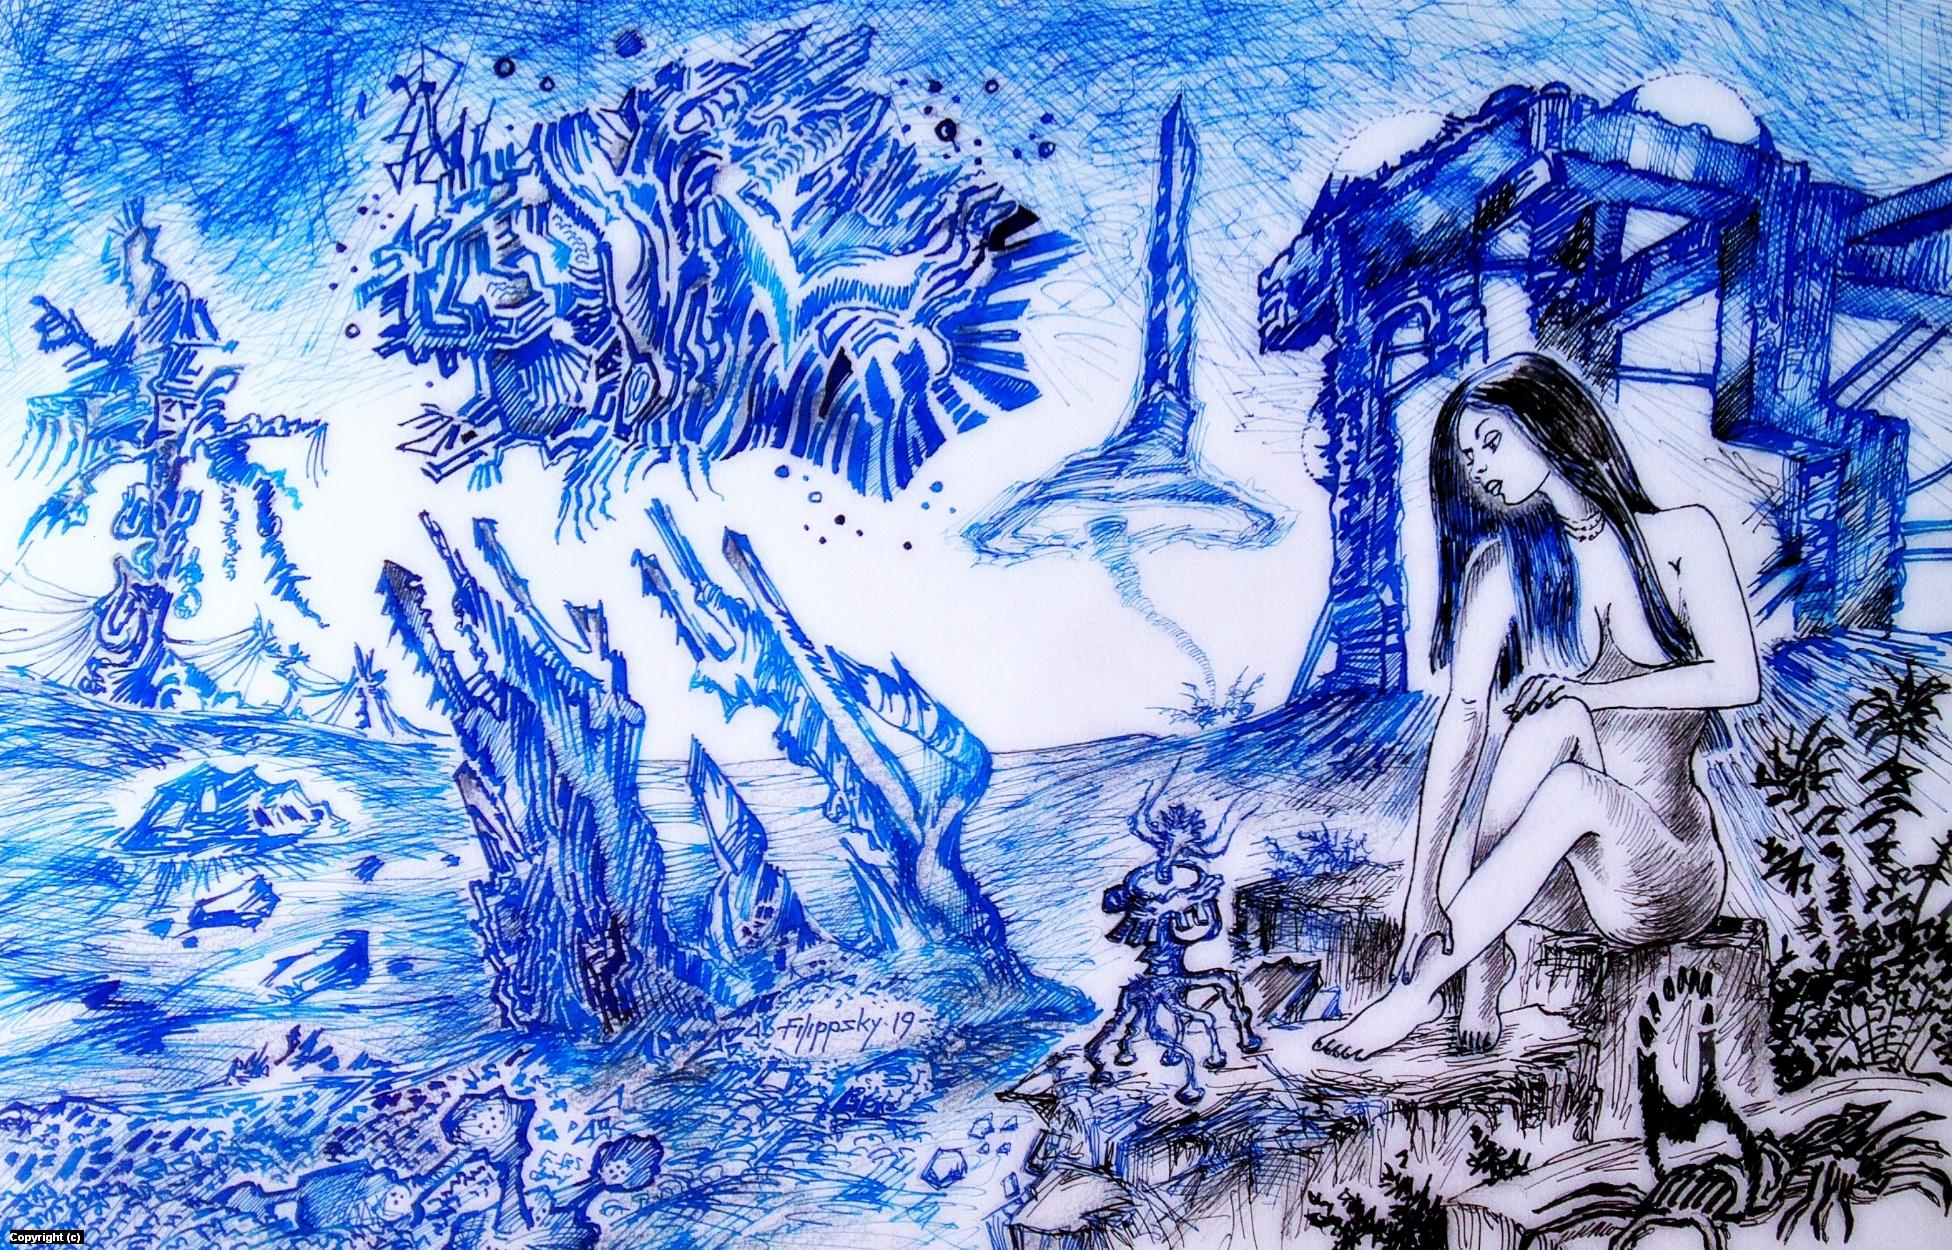 Dialogue. Artwork by Victor Filippsky